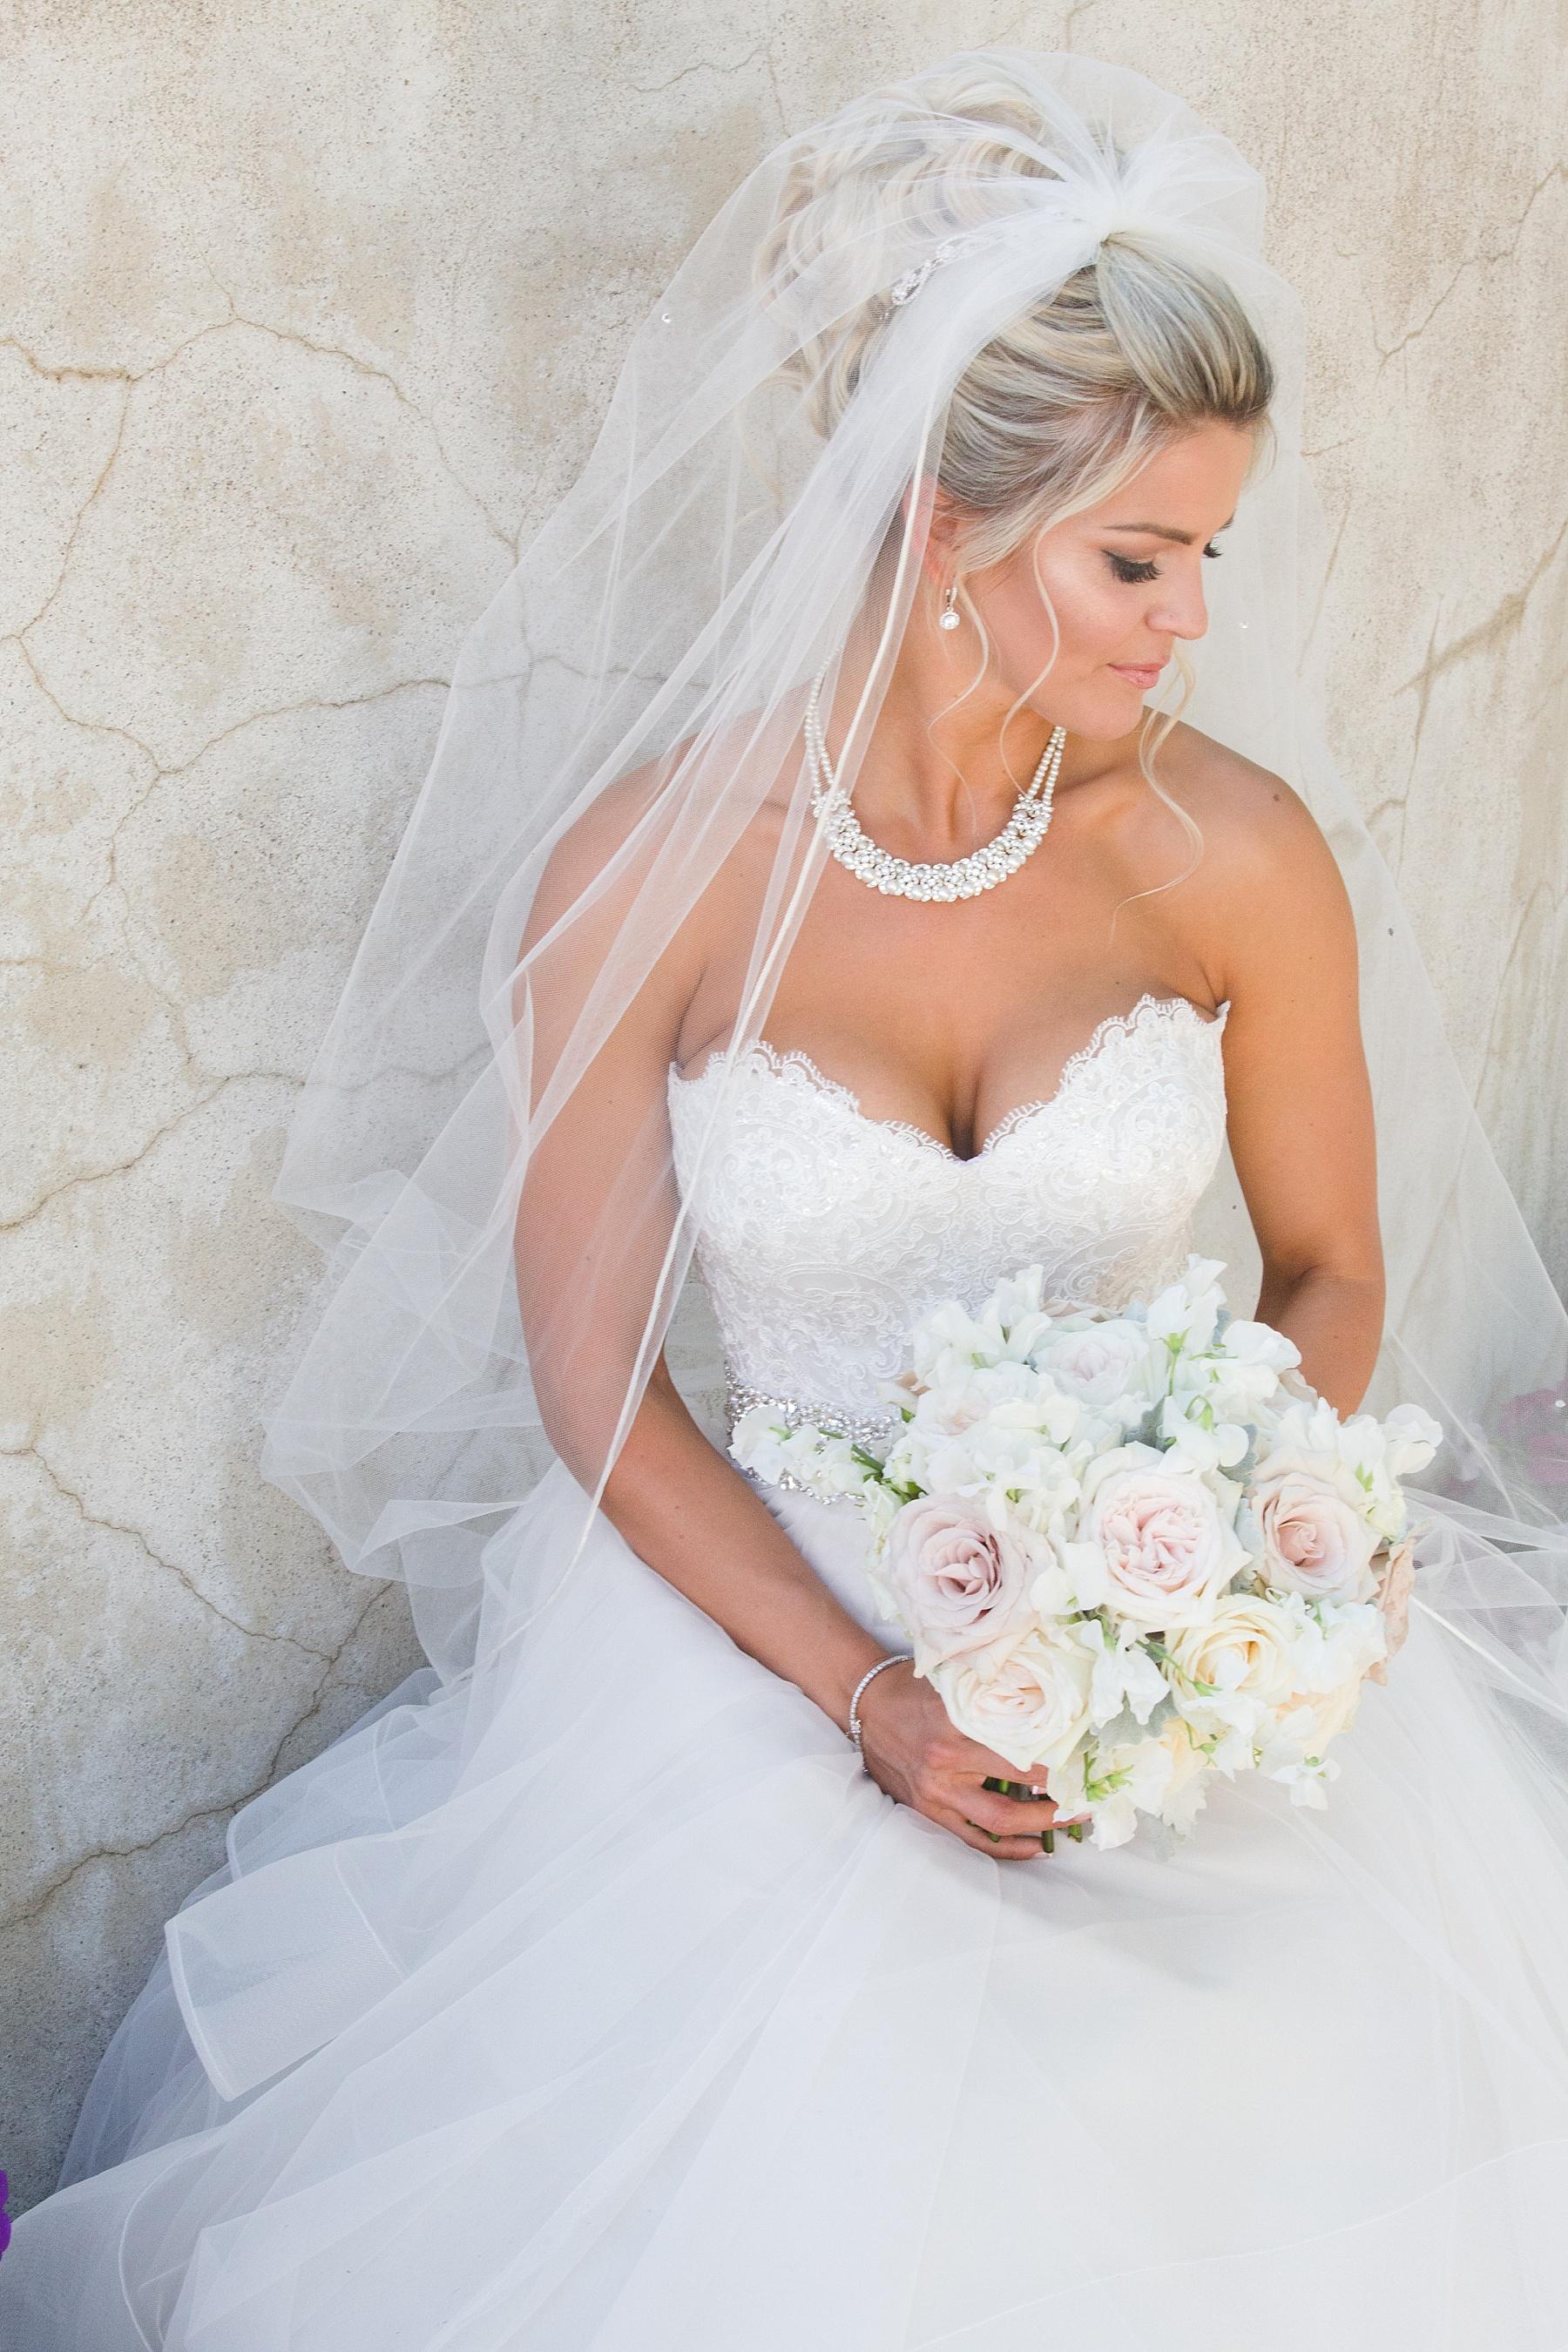 Elegant wedding photography in Calgary